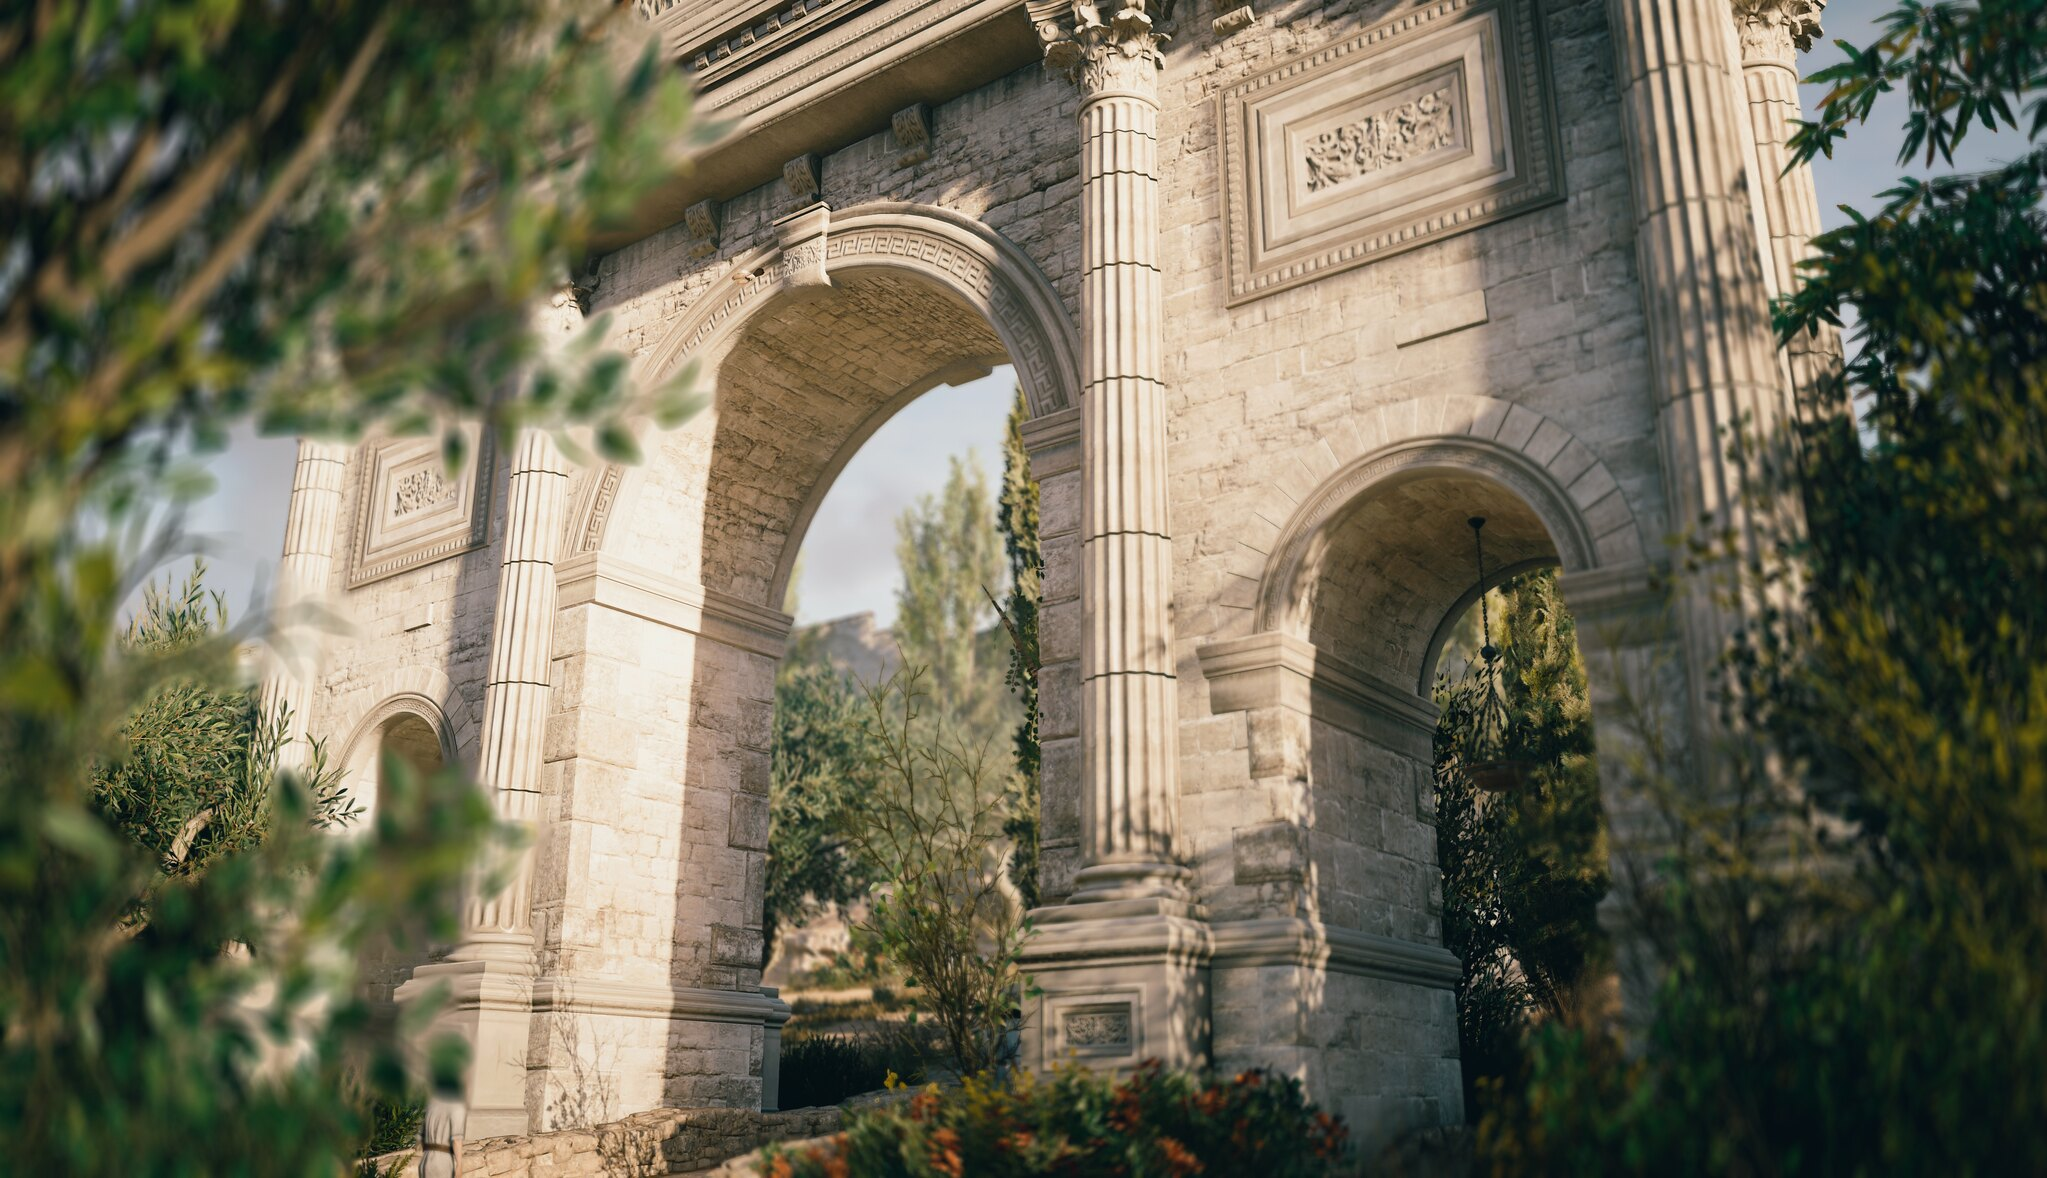 49210438078_8f1f435a61_k.jpg - Assassin's Creed: Origins